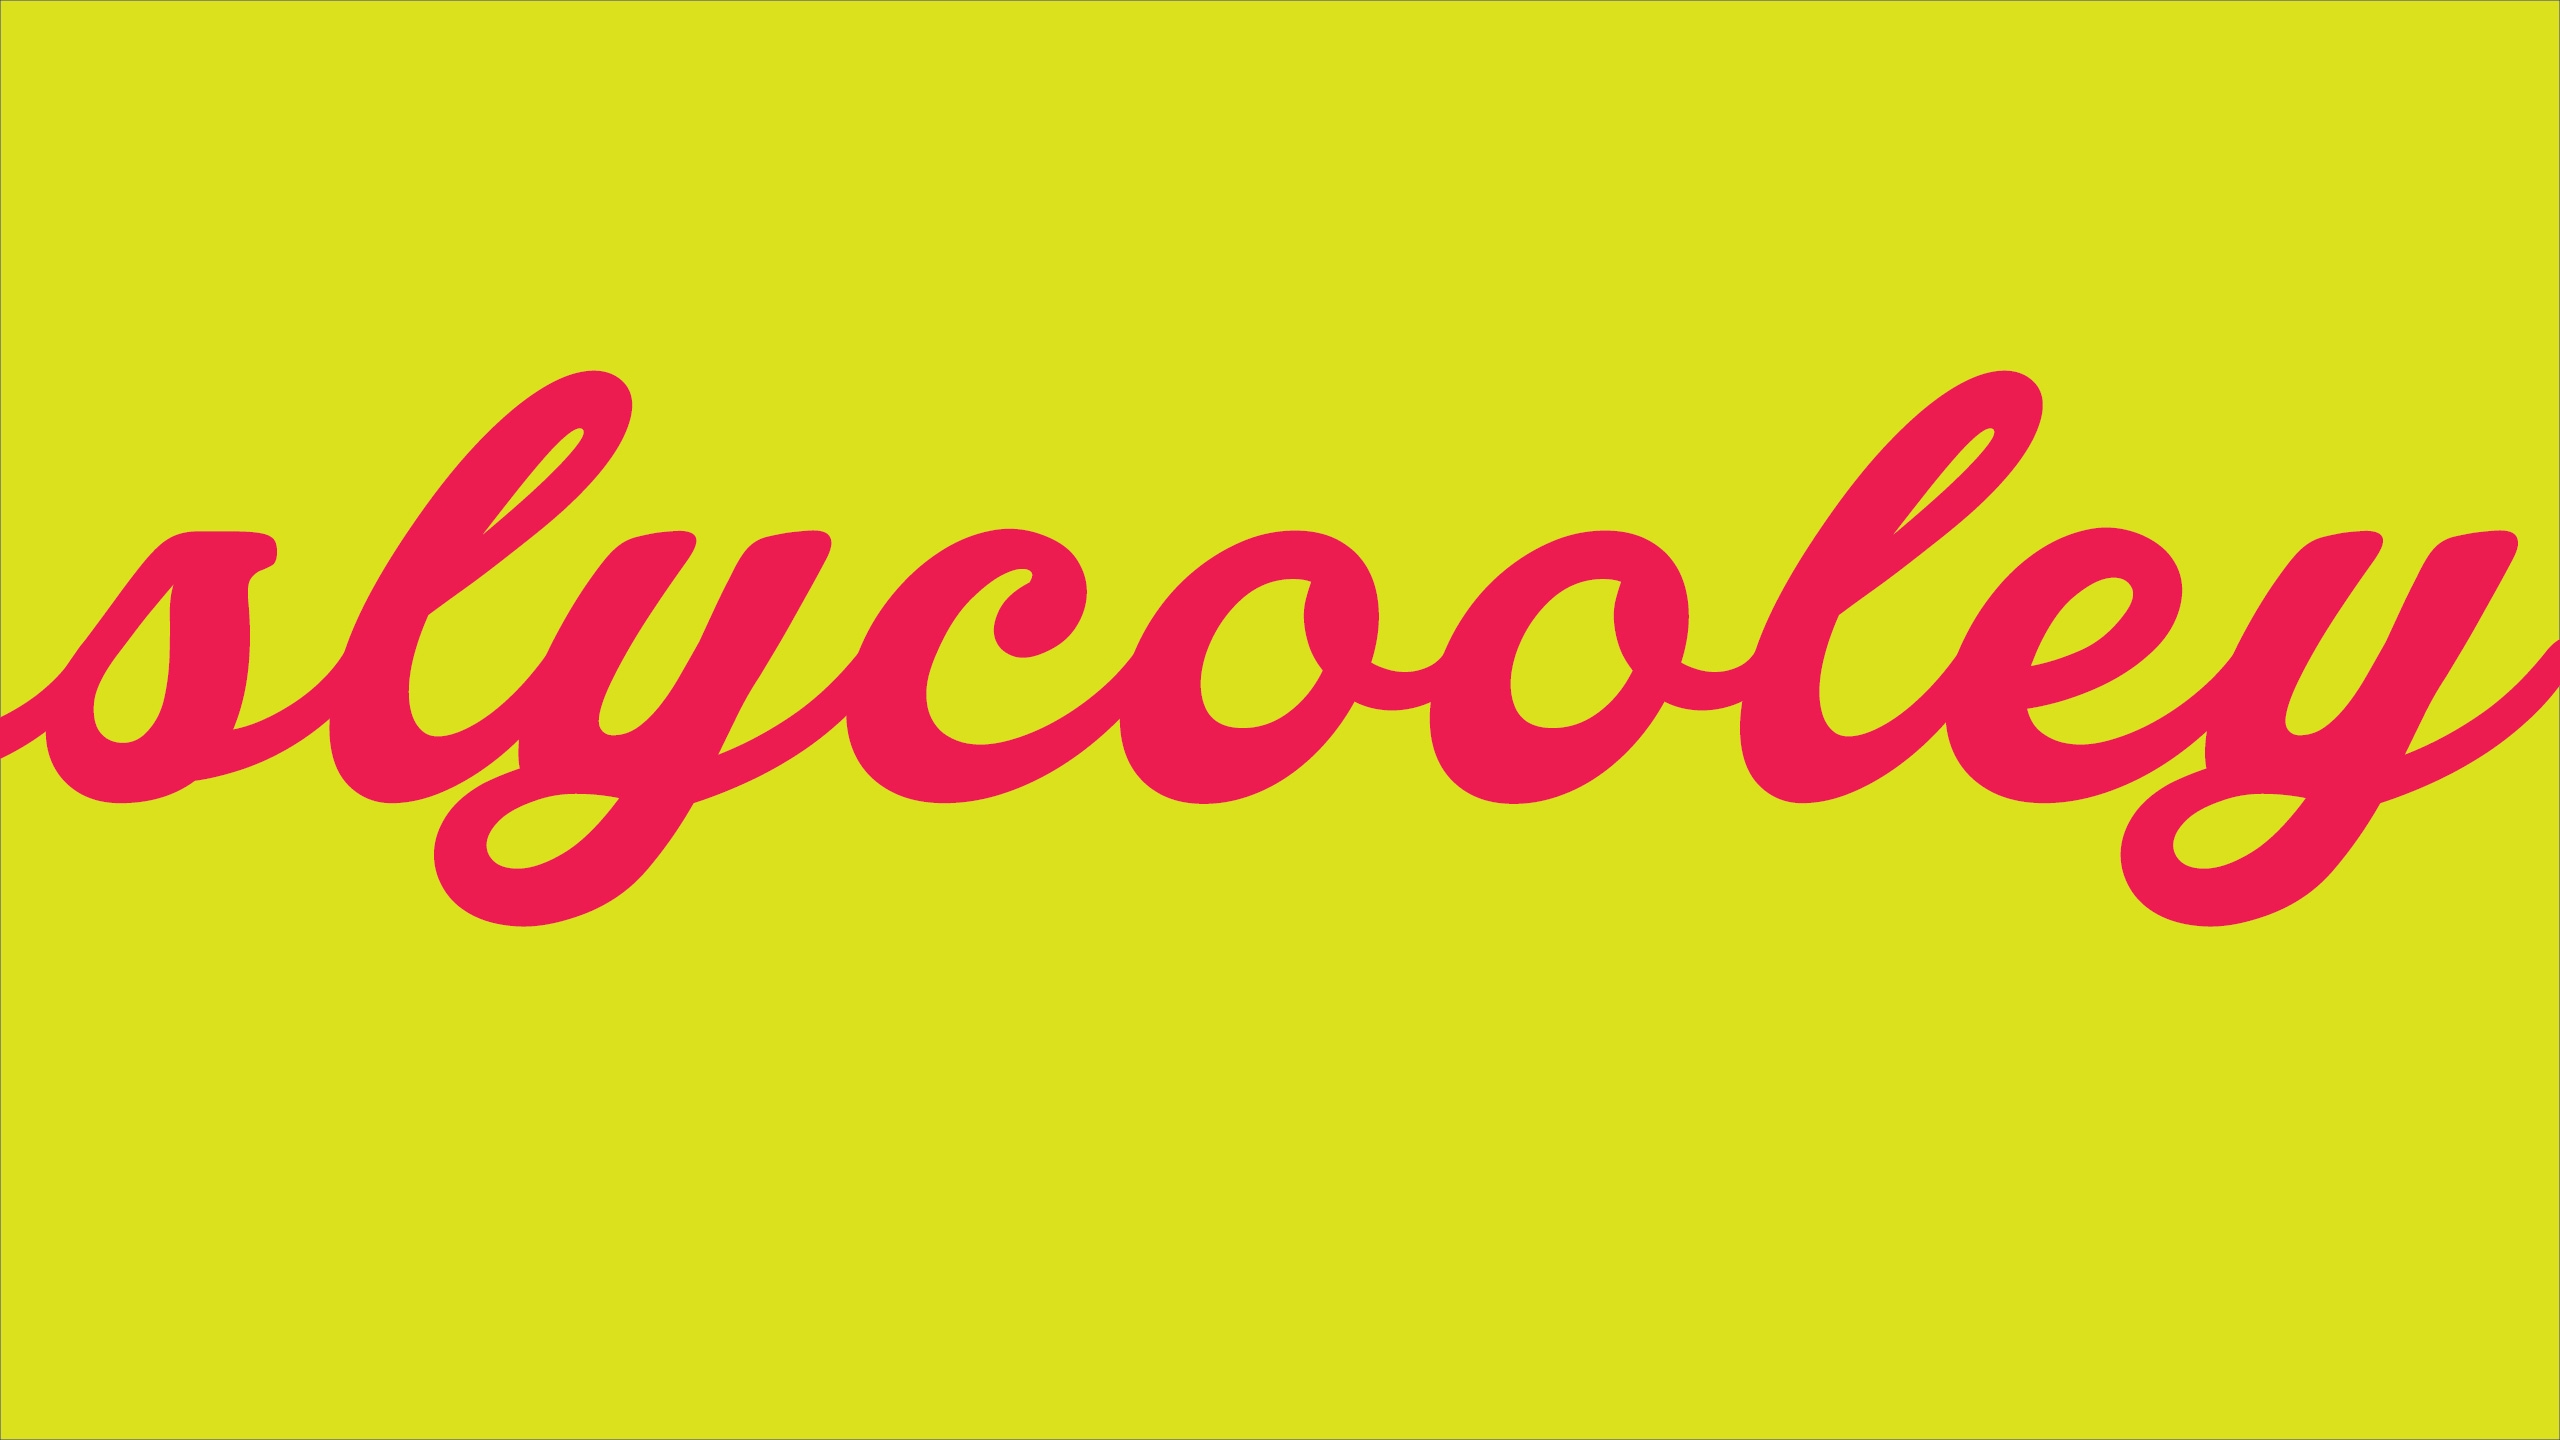 slycooley (@slycooley) Cover Image